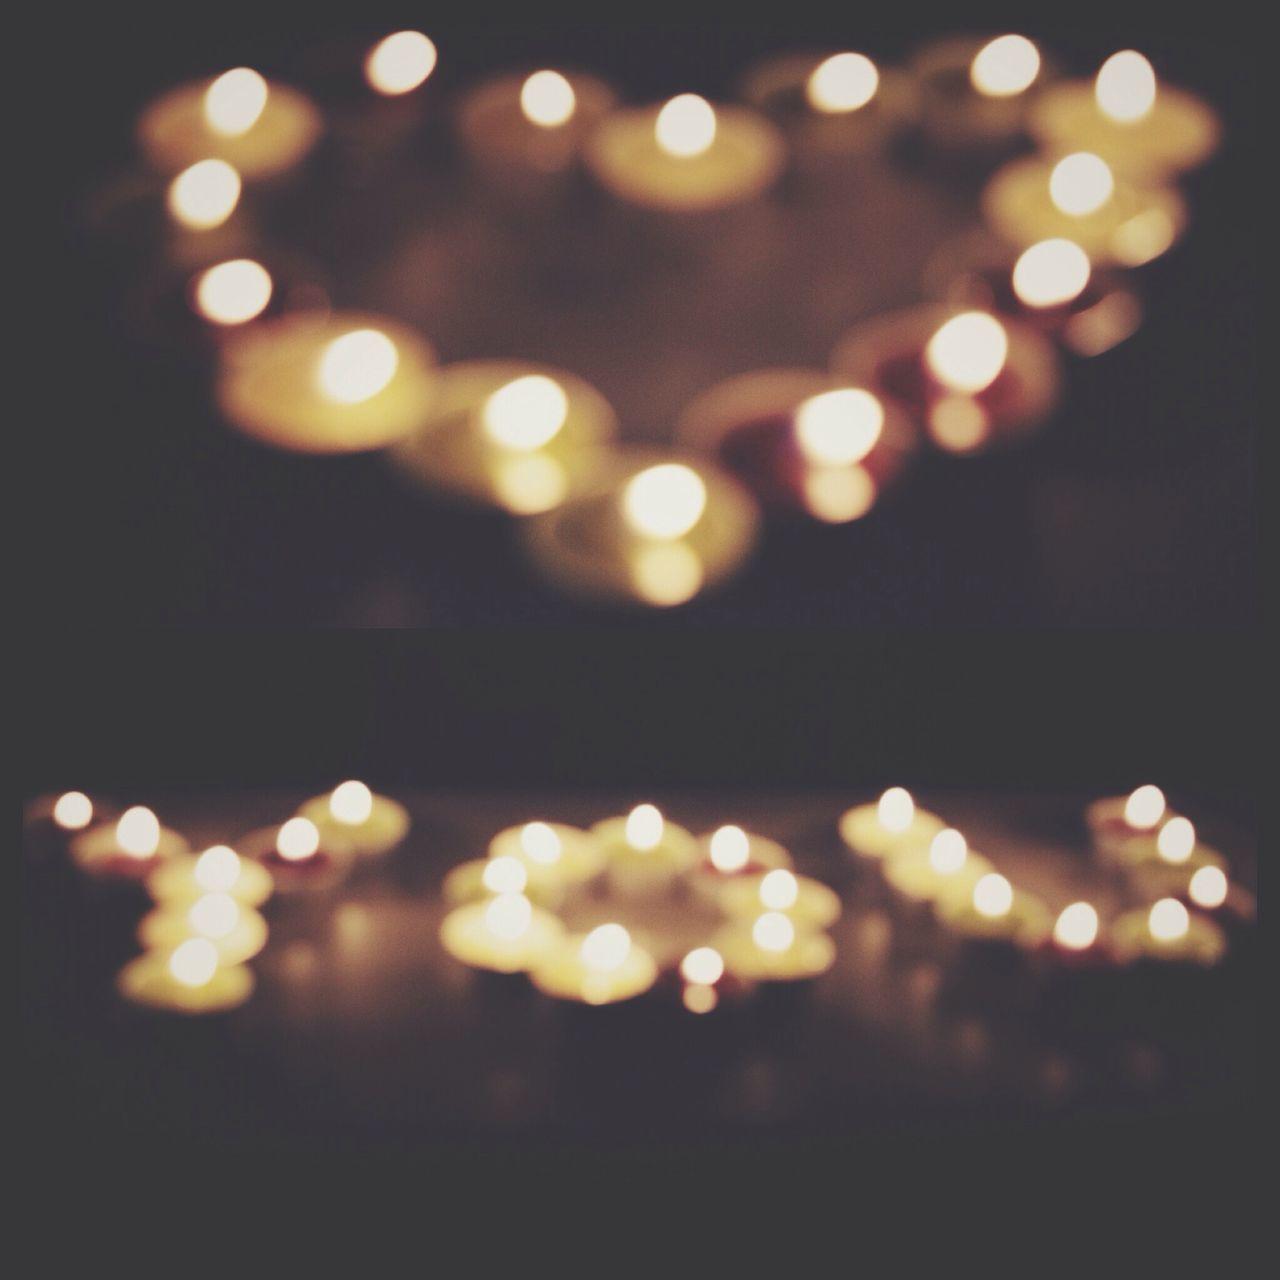 illuminated, glowing, lighting equipment, night, defocused, heat - temperature, no people, celebration, burning, light effect, flame, close-up, light bulb, backgrounds, outdoors, black background, diya - oil lamp